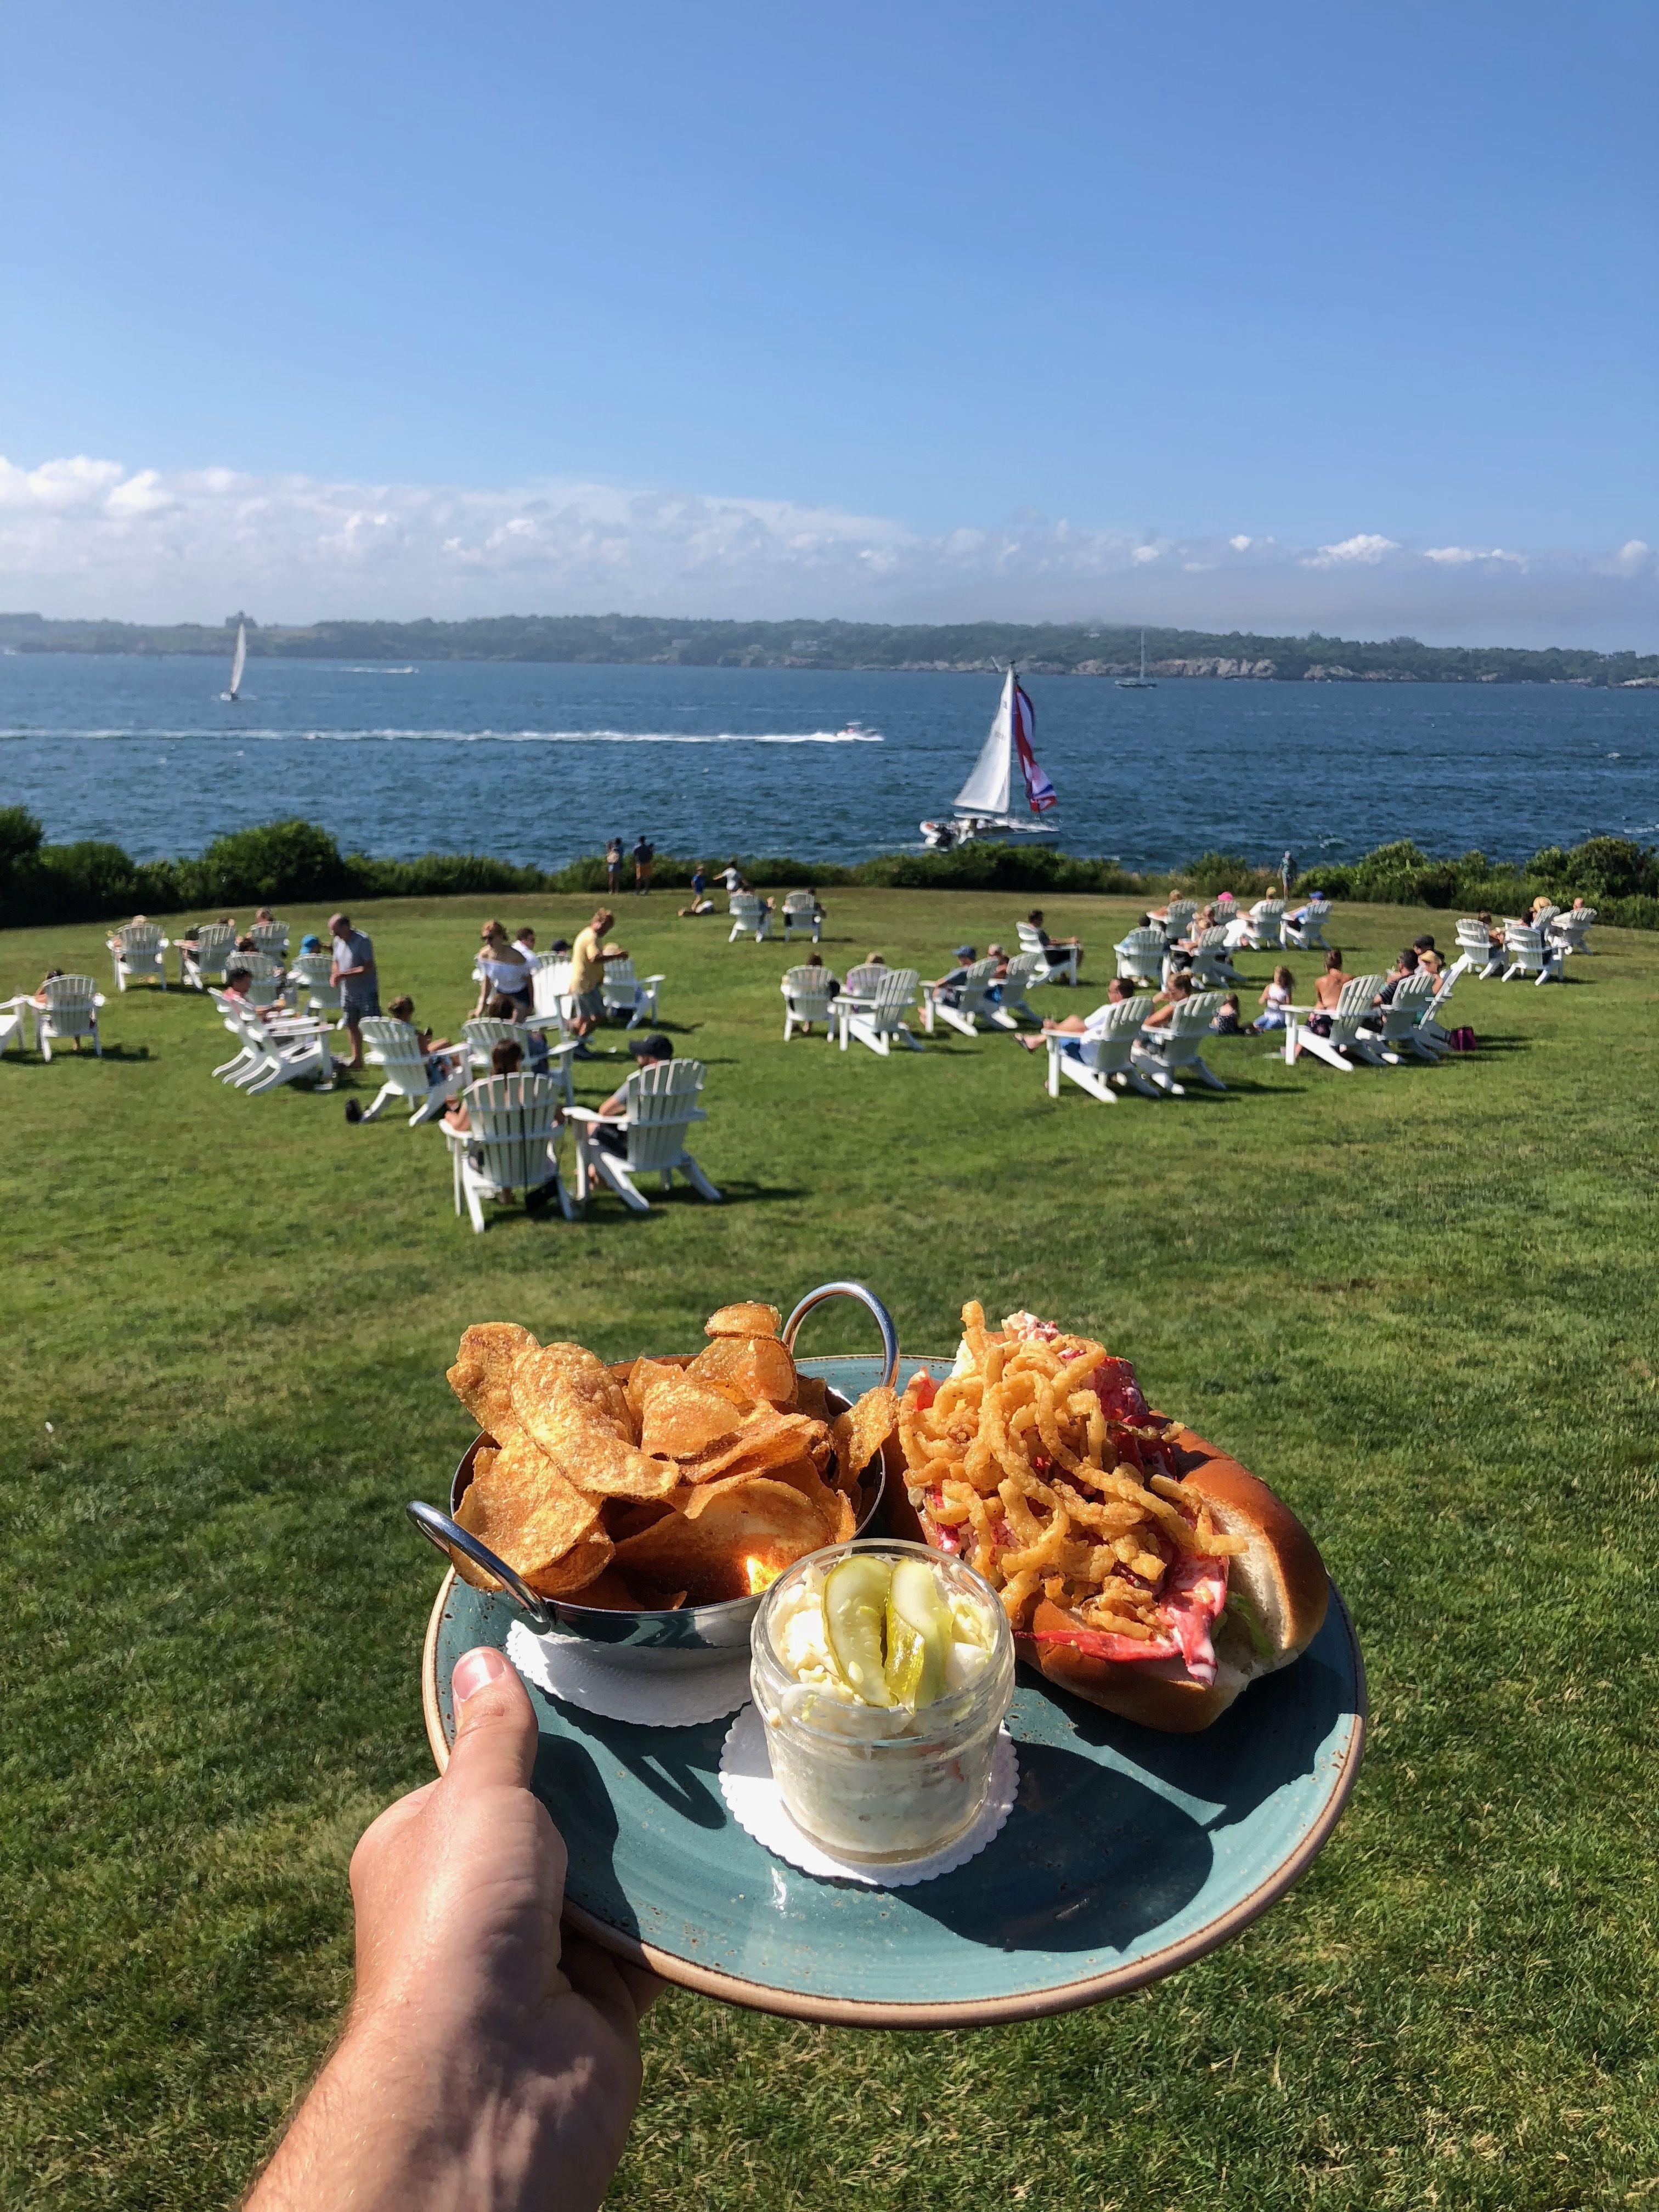 Rhode Island Travel Guide - Castle Hill Lawn